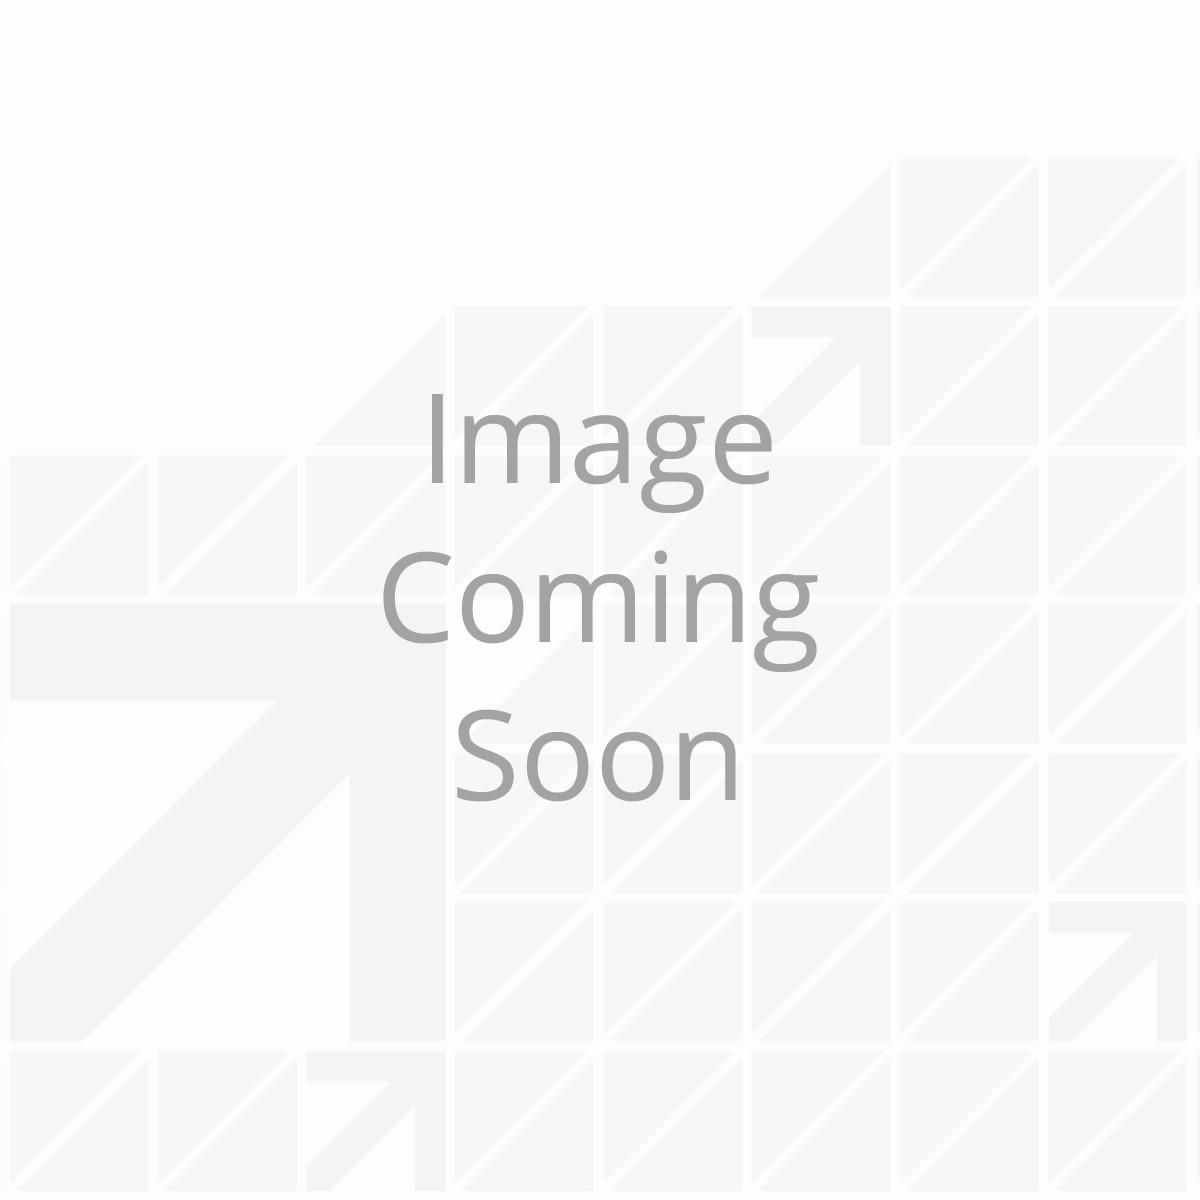 18' Destination Awning Roller Assembly - Solid Black (Black Shield)